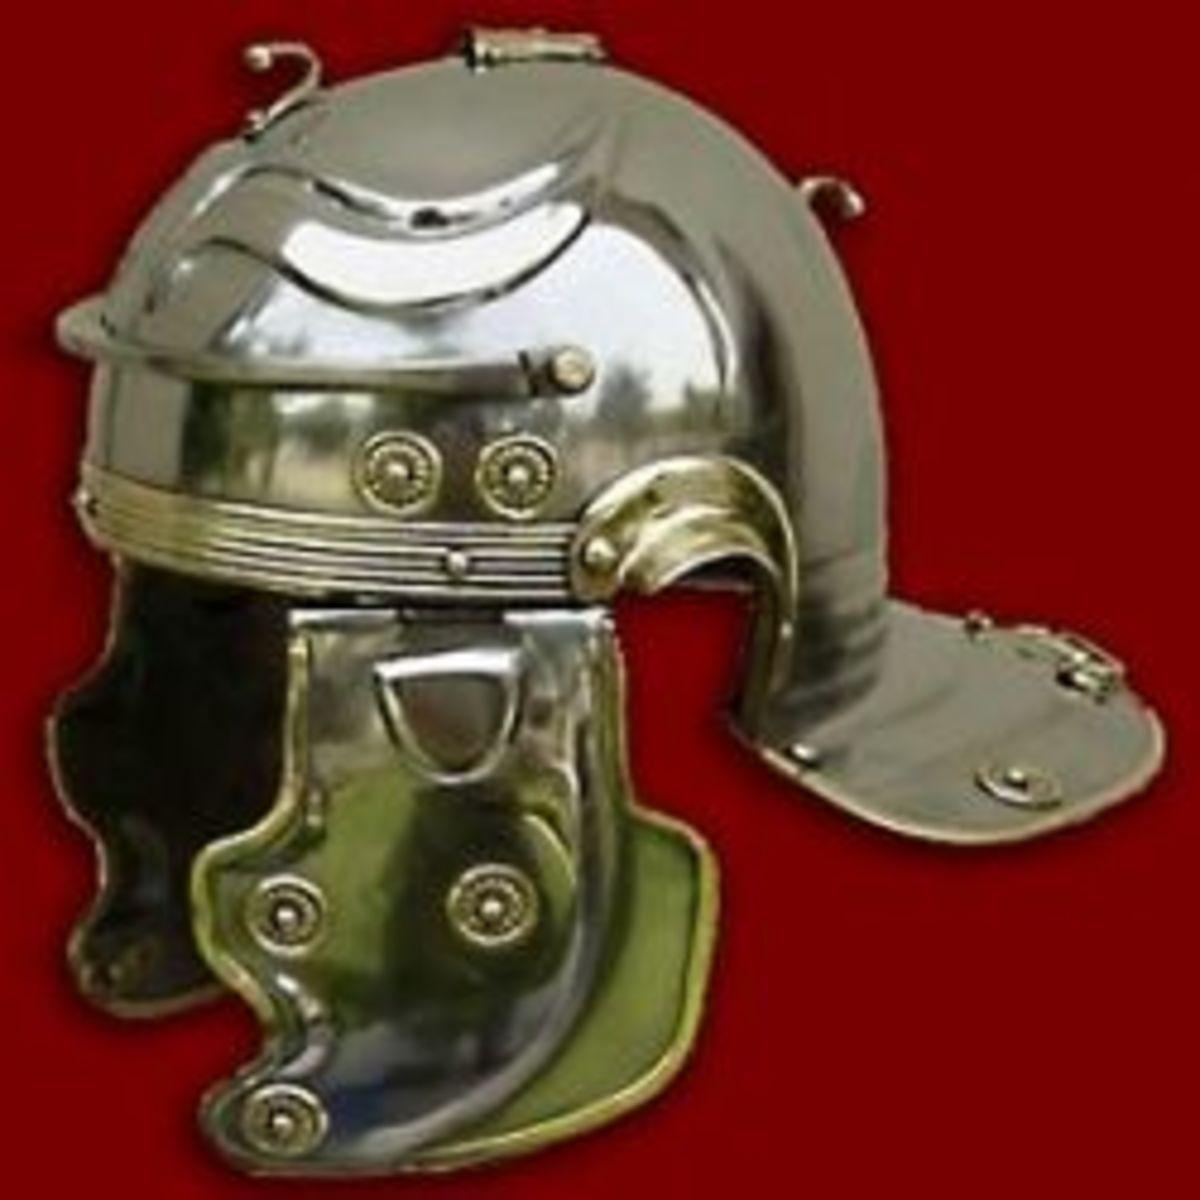 Imperial Gallic Helmet